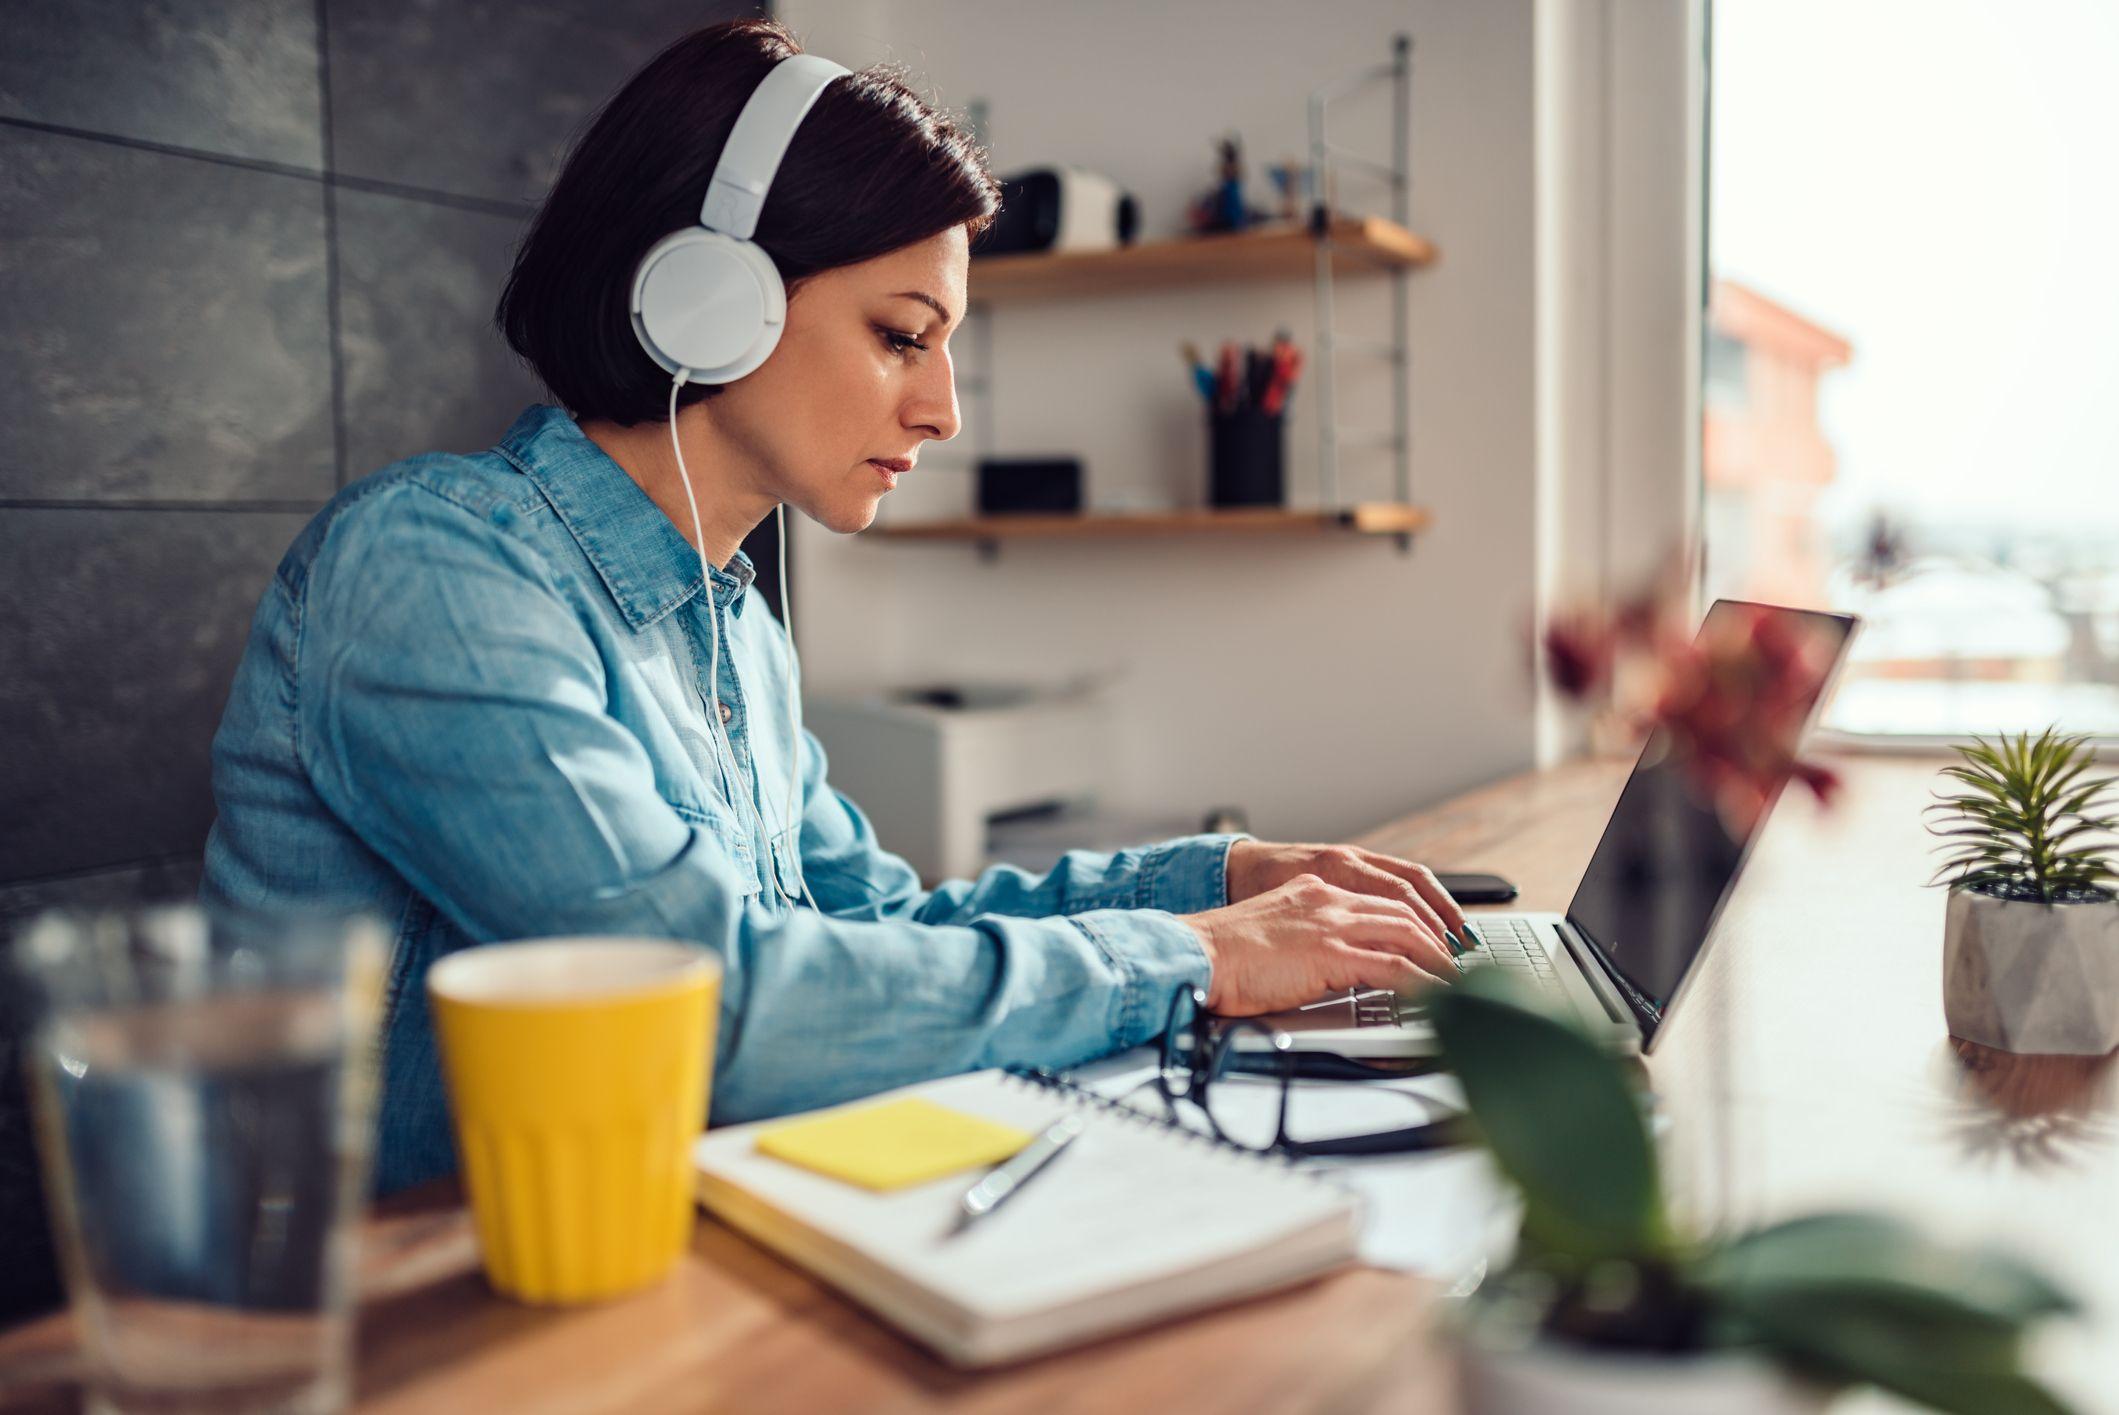 Remote working finance teams drive CloudStart in 2020